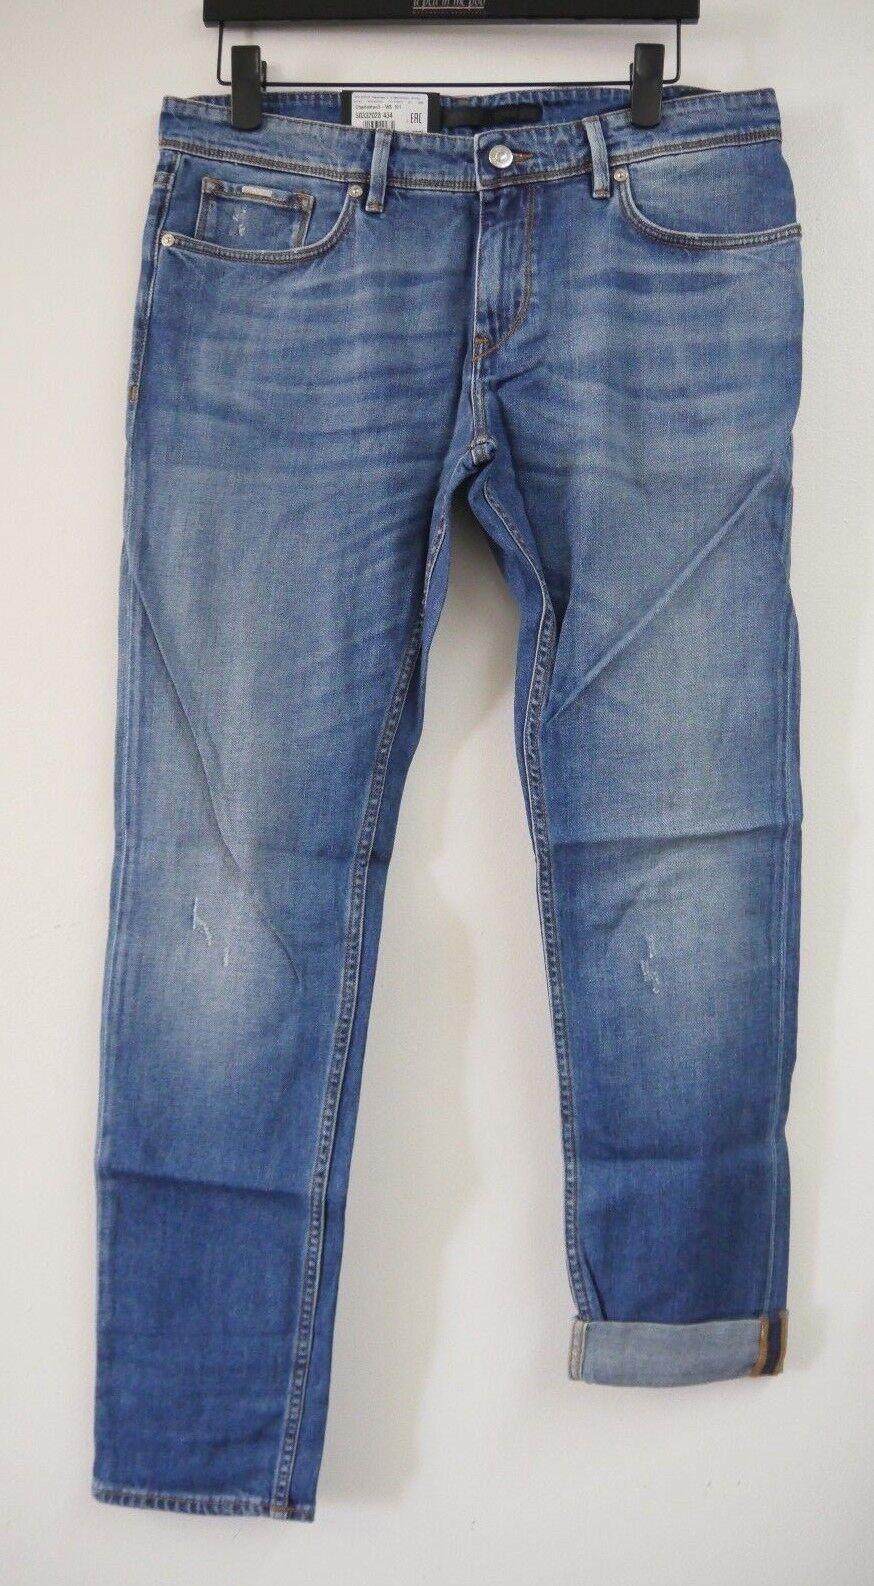 Hugo Boss Men's Charleston 3 Finest Italian Fabric Stretch bluee Jeans, W34 L32